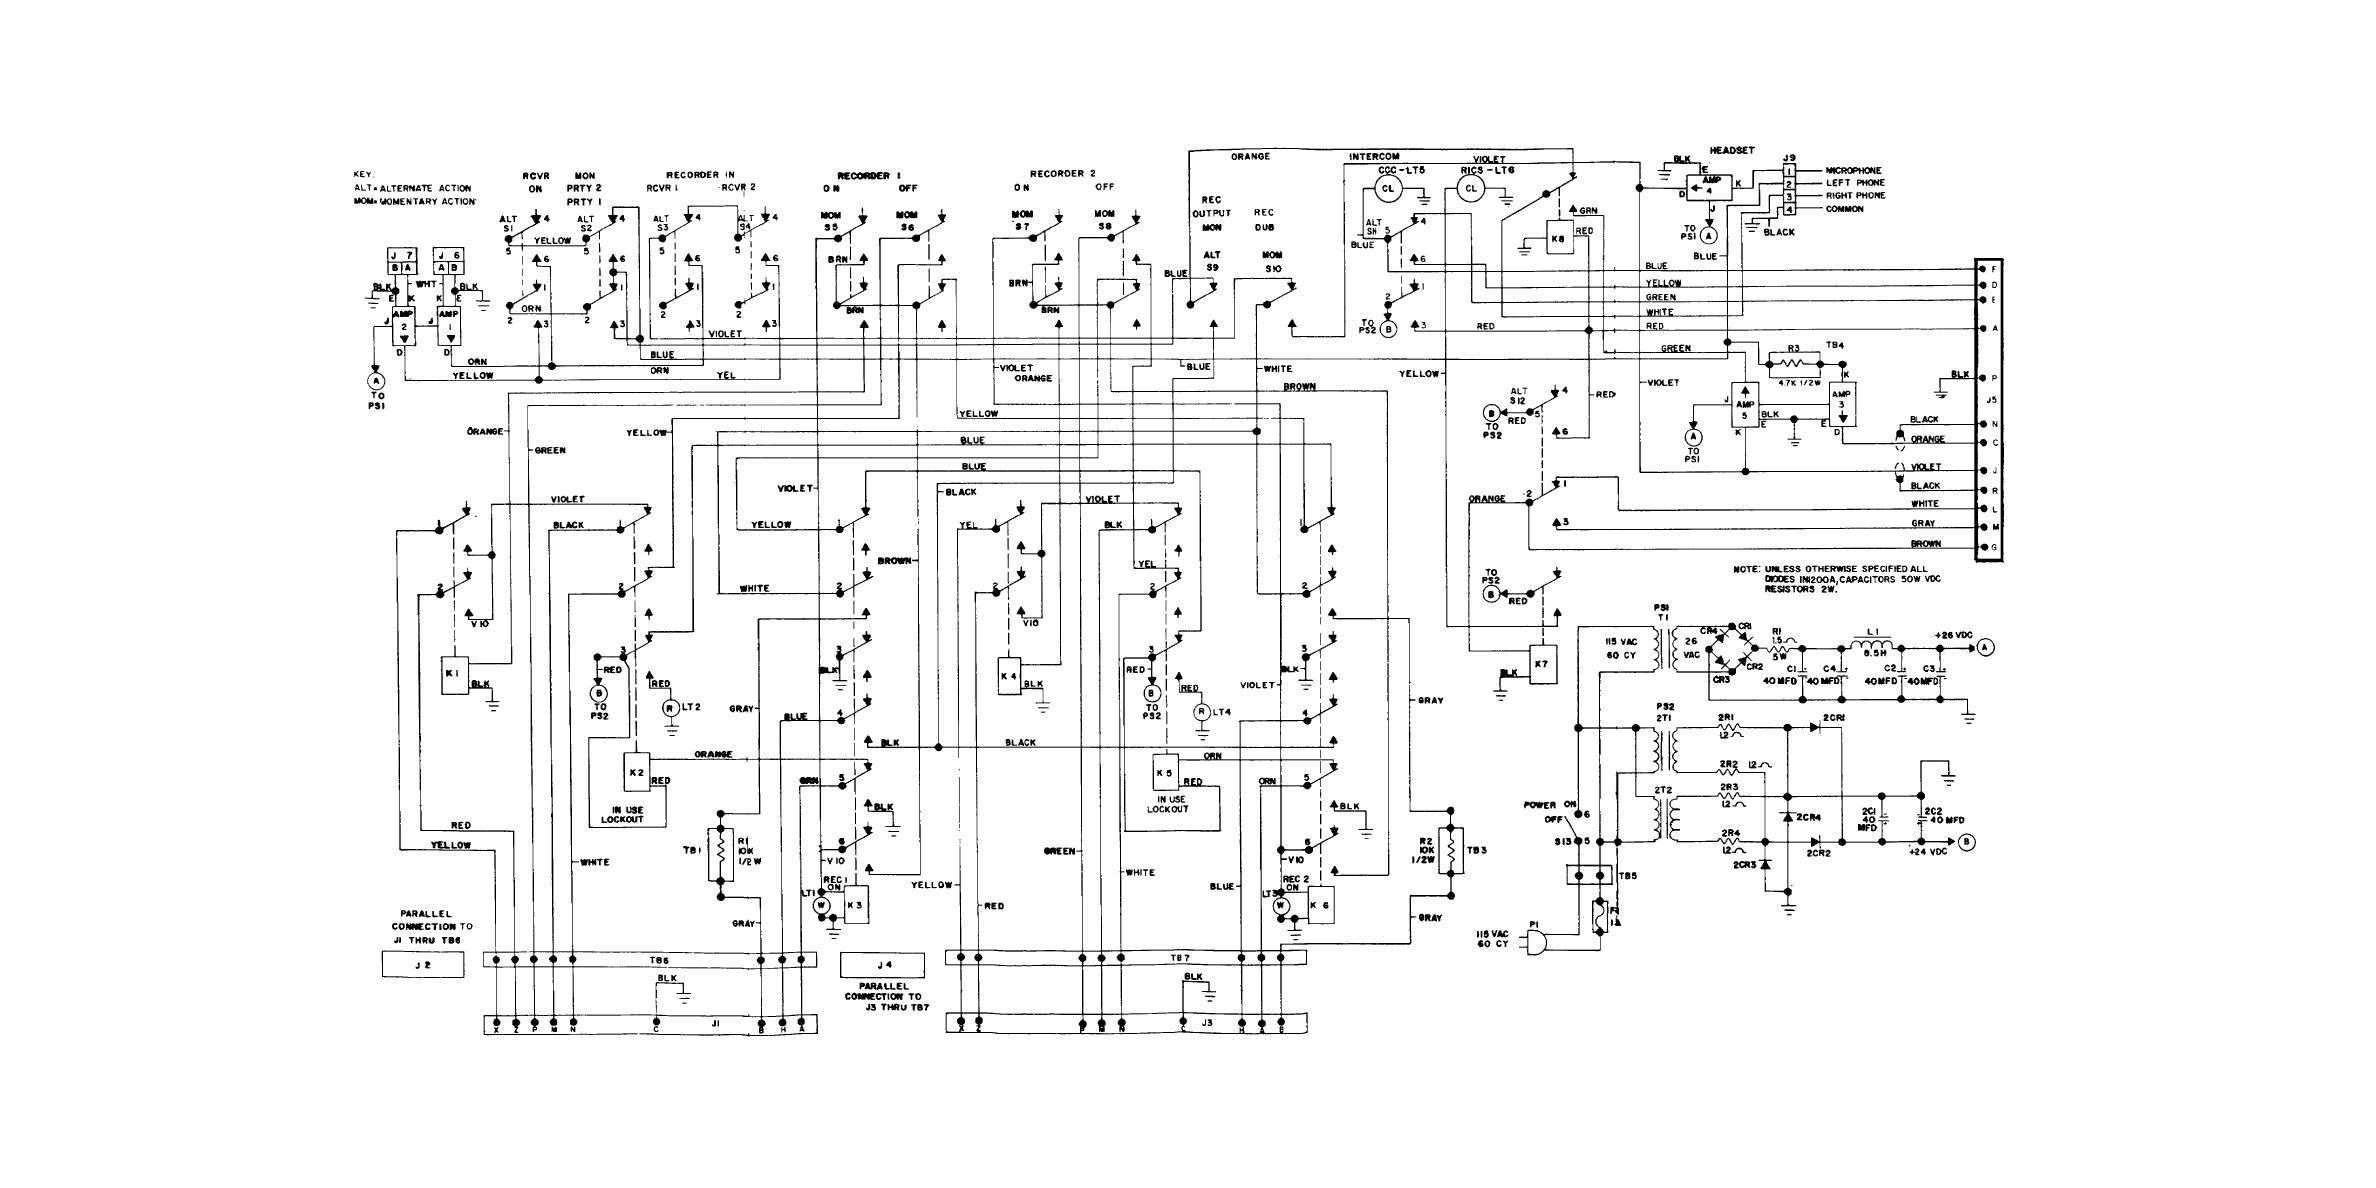 fo 8 schematic monitor control panel sb 2600 g. Black Bedroom Furniture Sets. Home Design Ideas